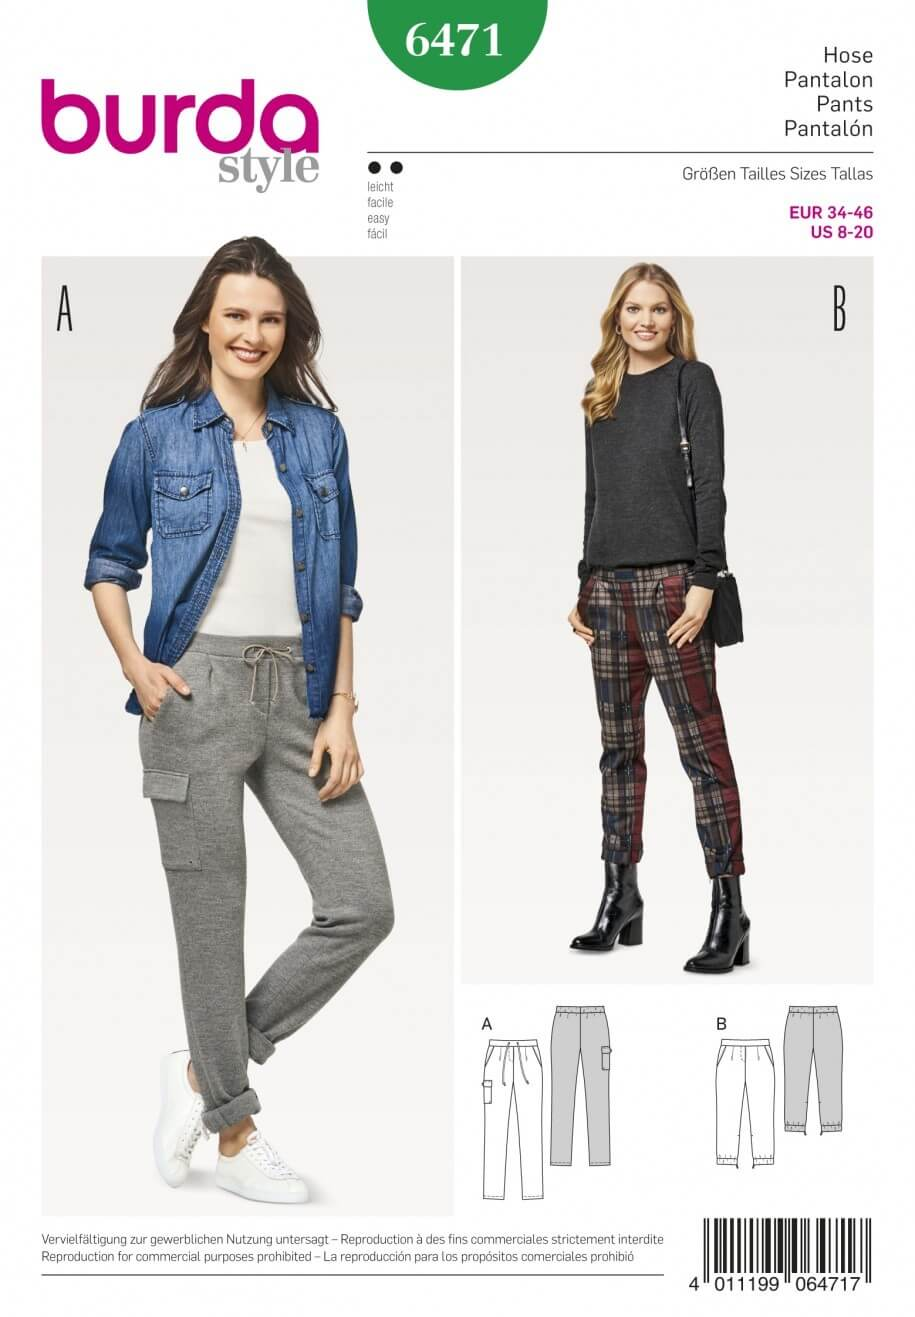 Burda Style Women's Super Comfortable Trousers Dress Sewing Pattern 6471